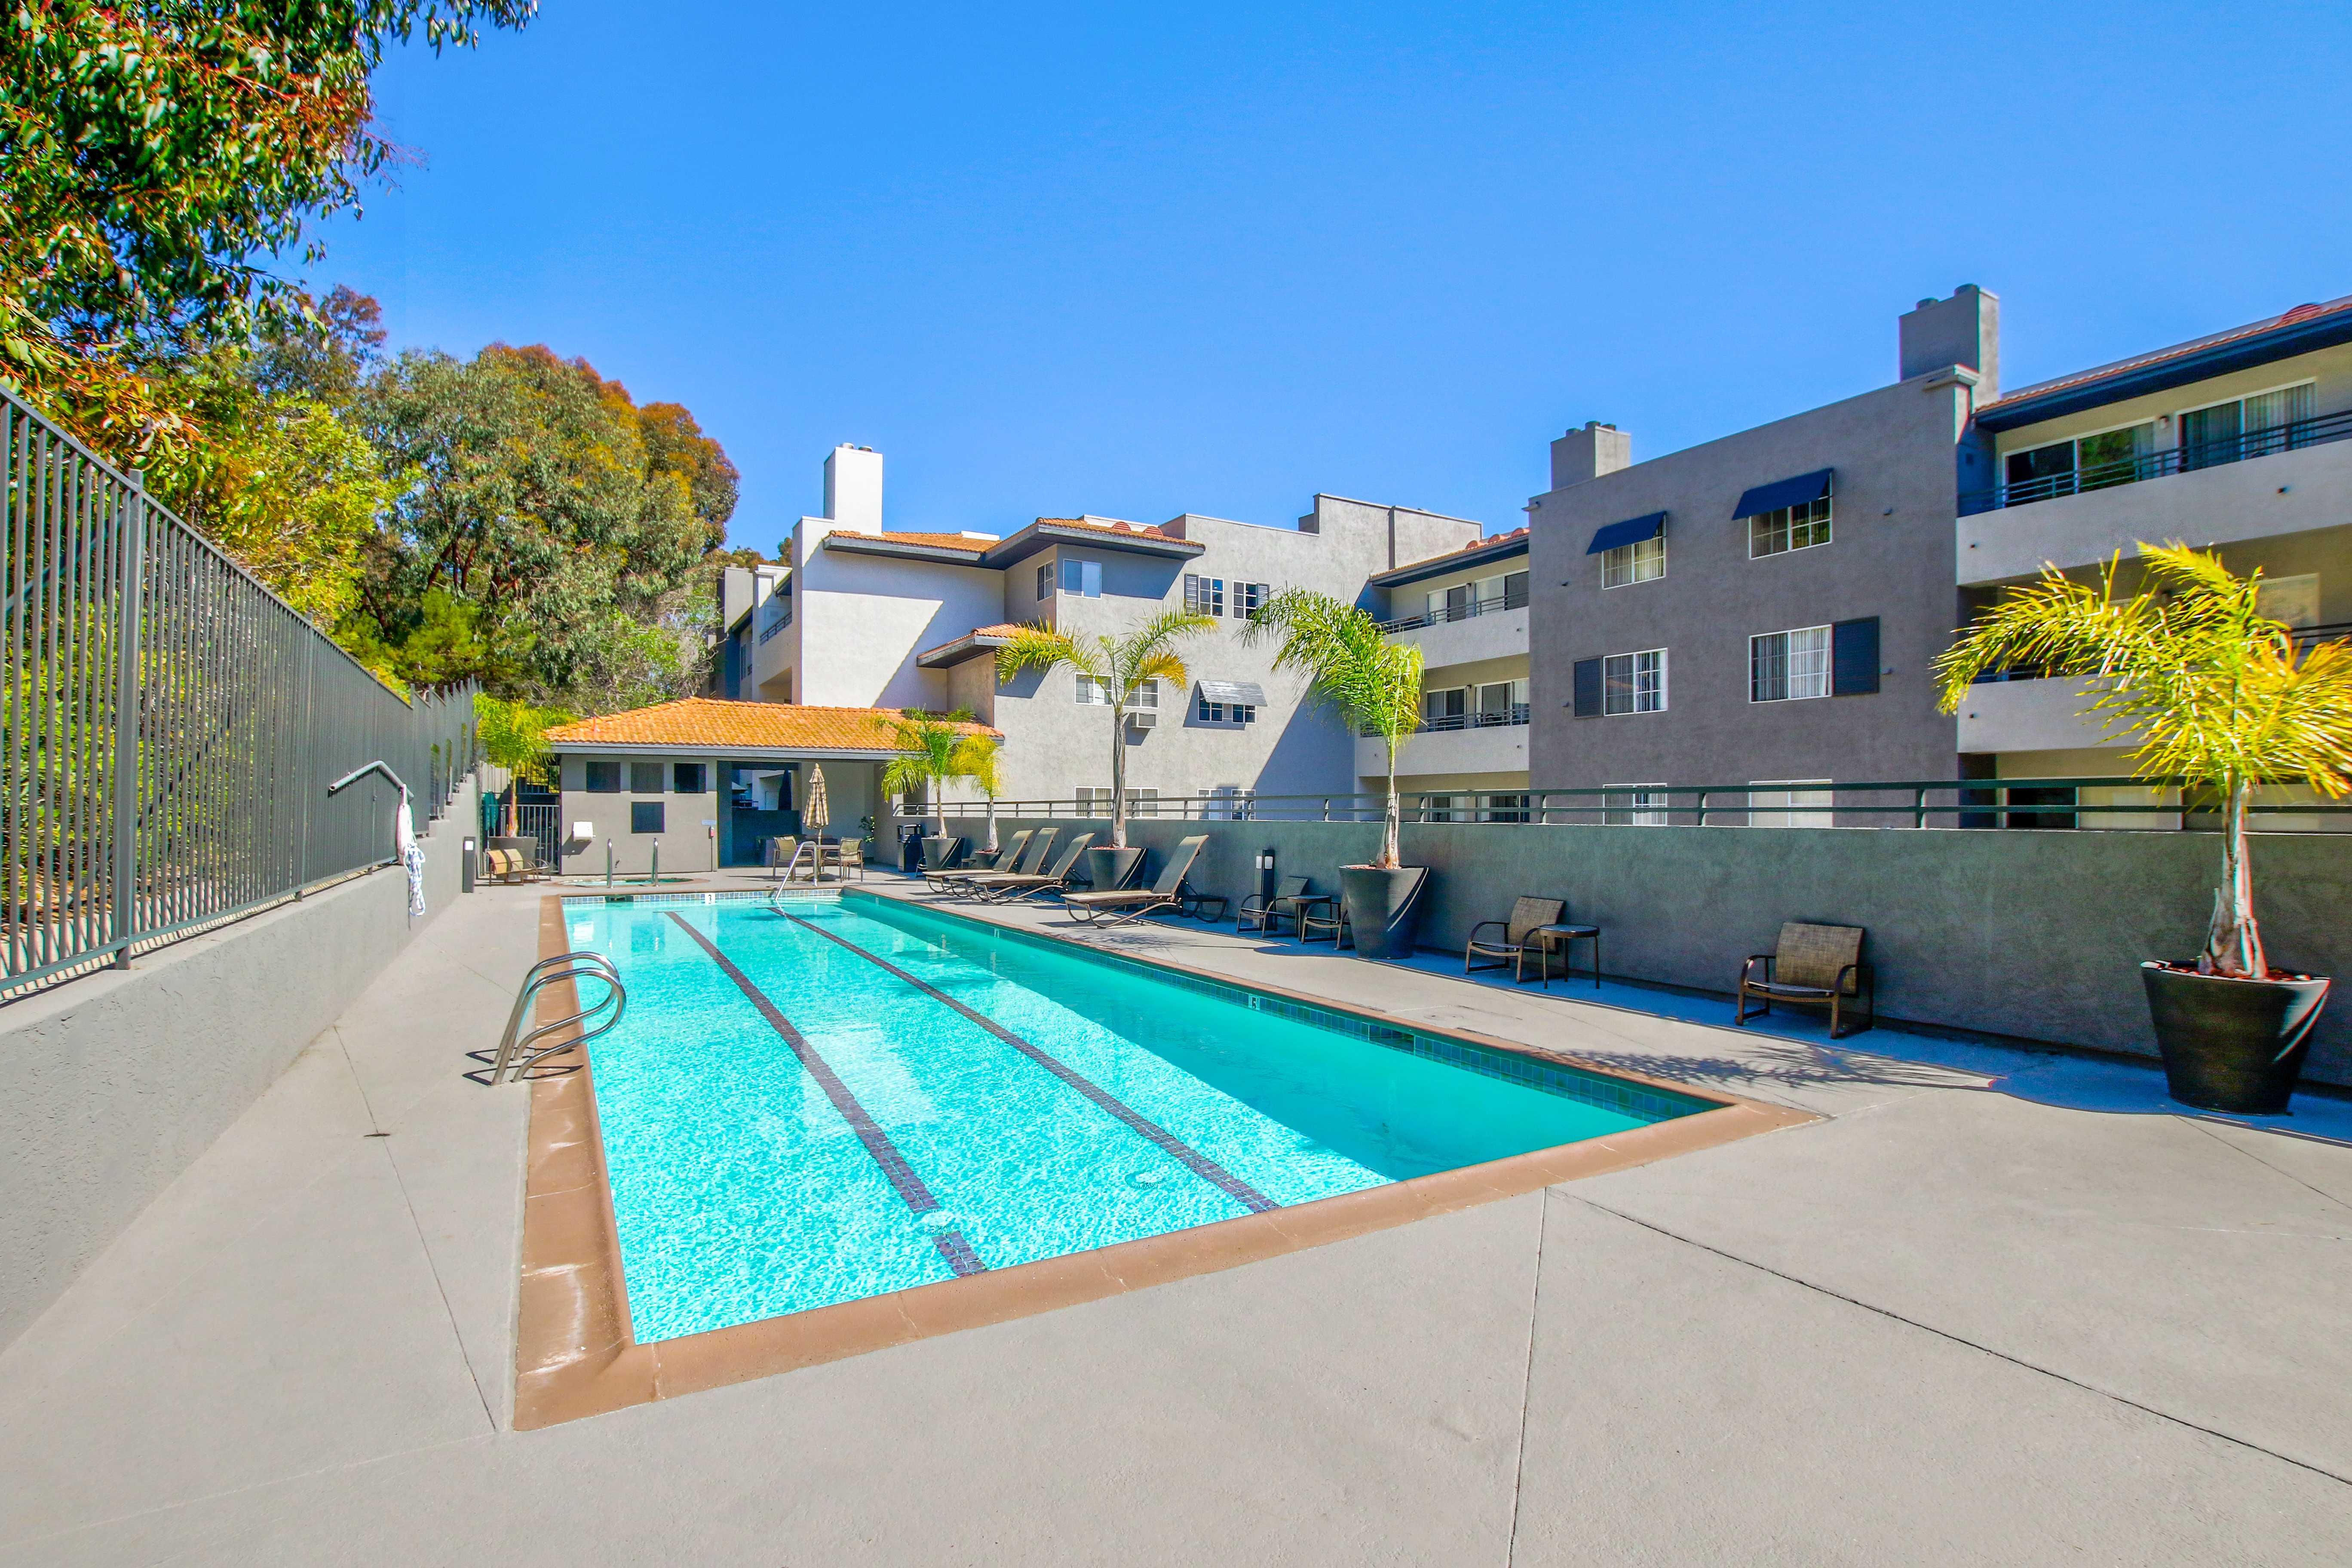 Spacious pool in San Diego, California